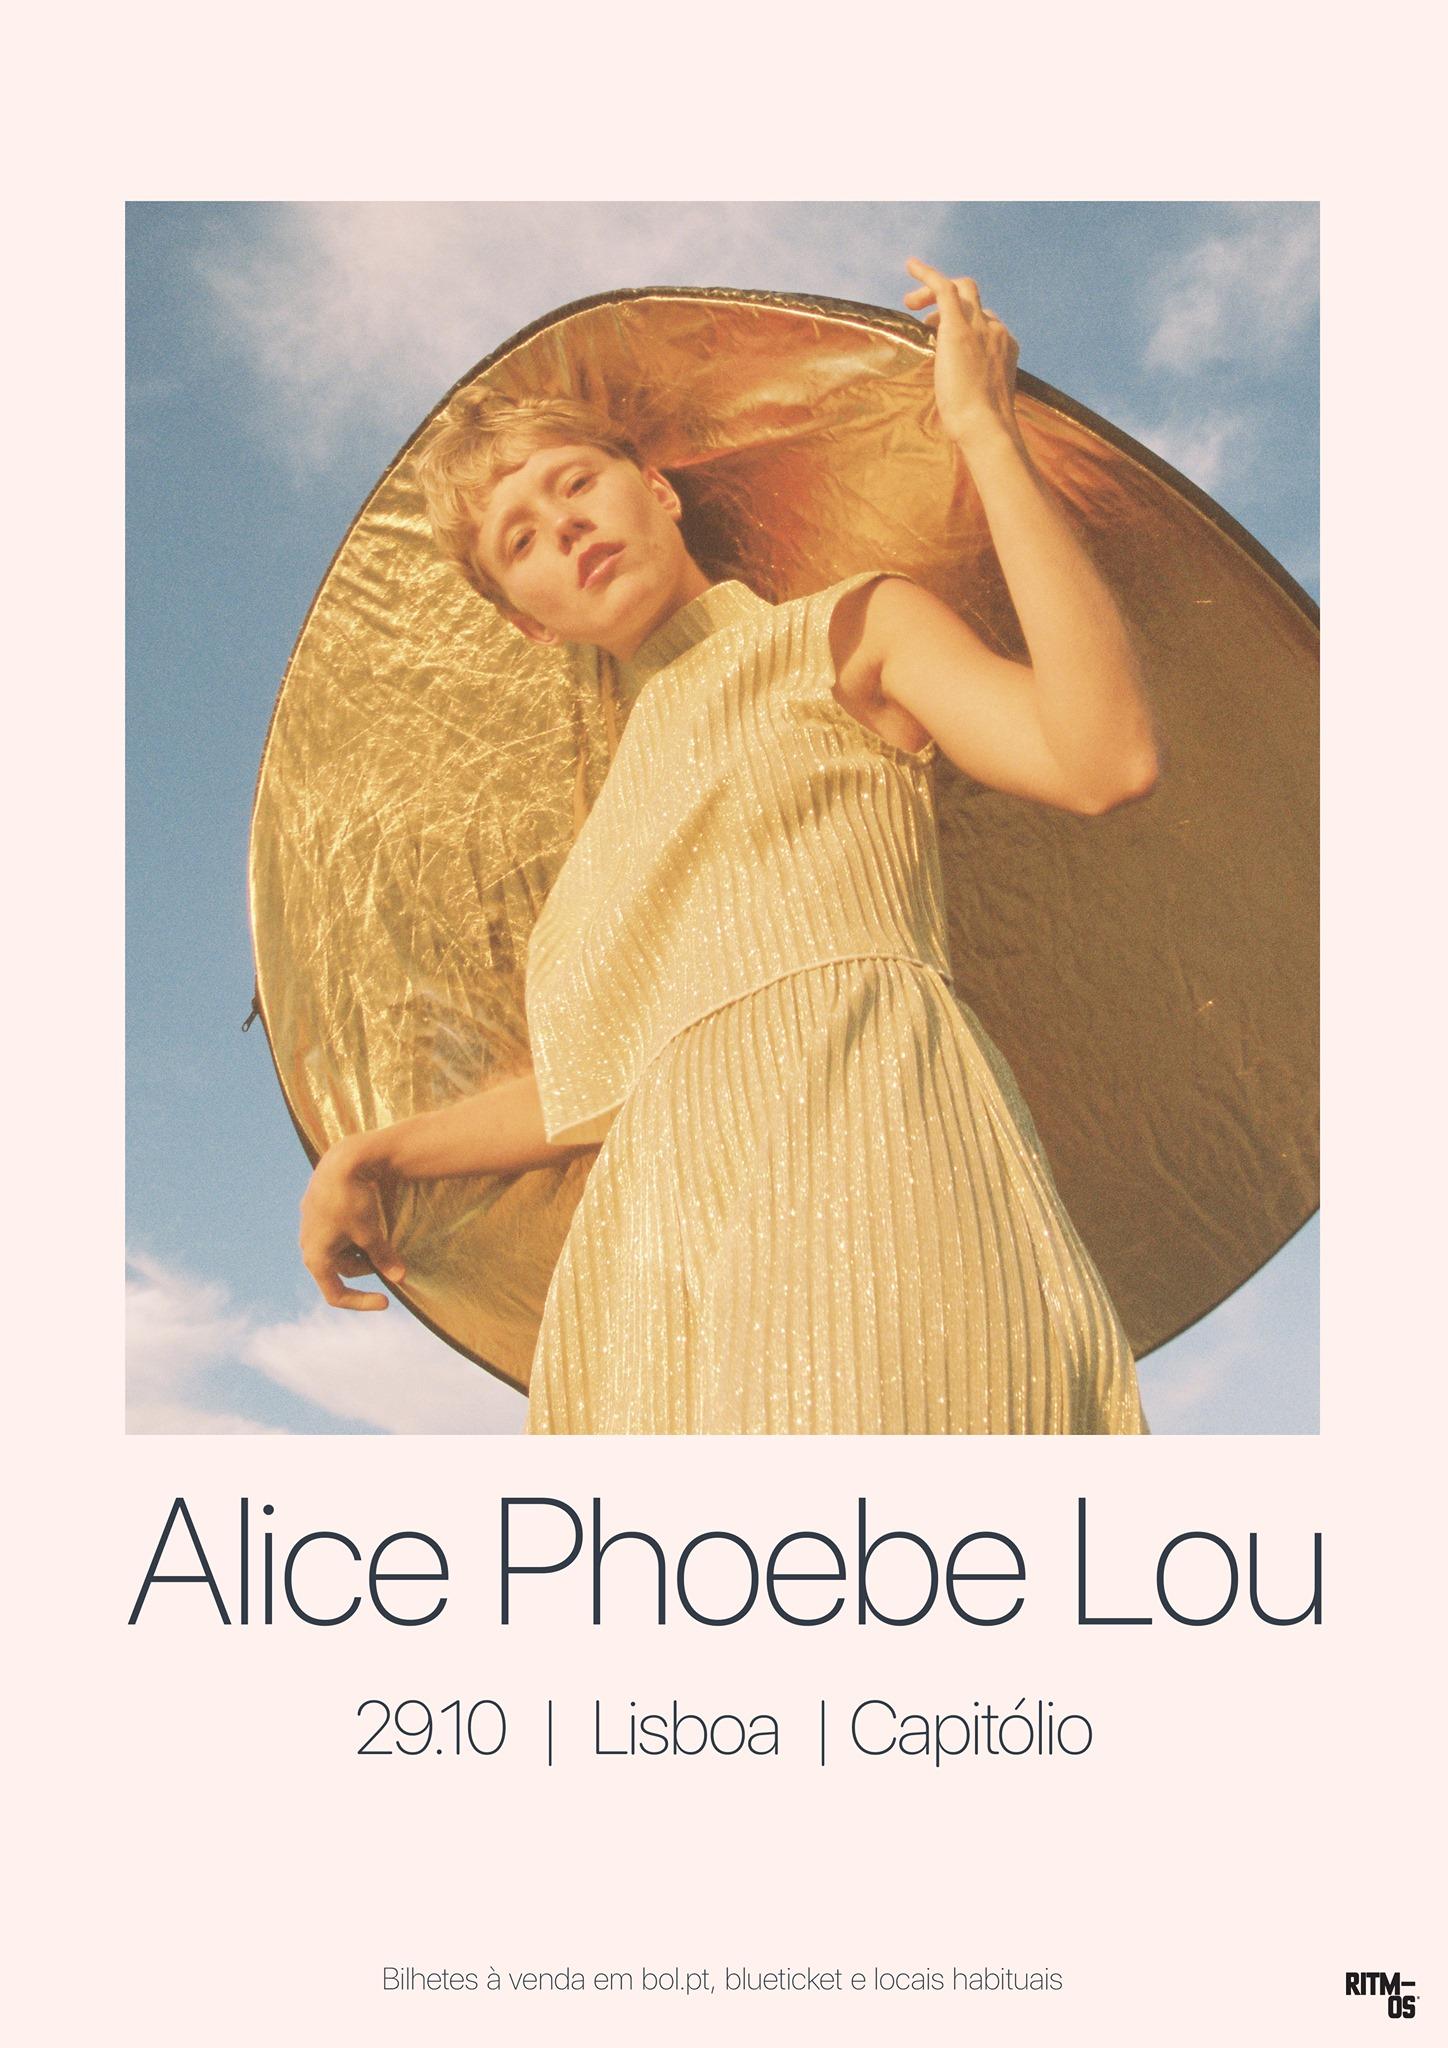 Alice Phoebe Lou | Capitólio, Lisboa Portugal